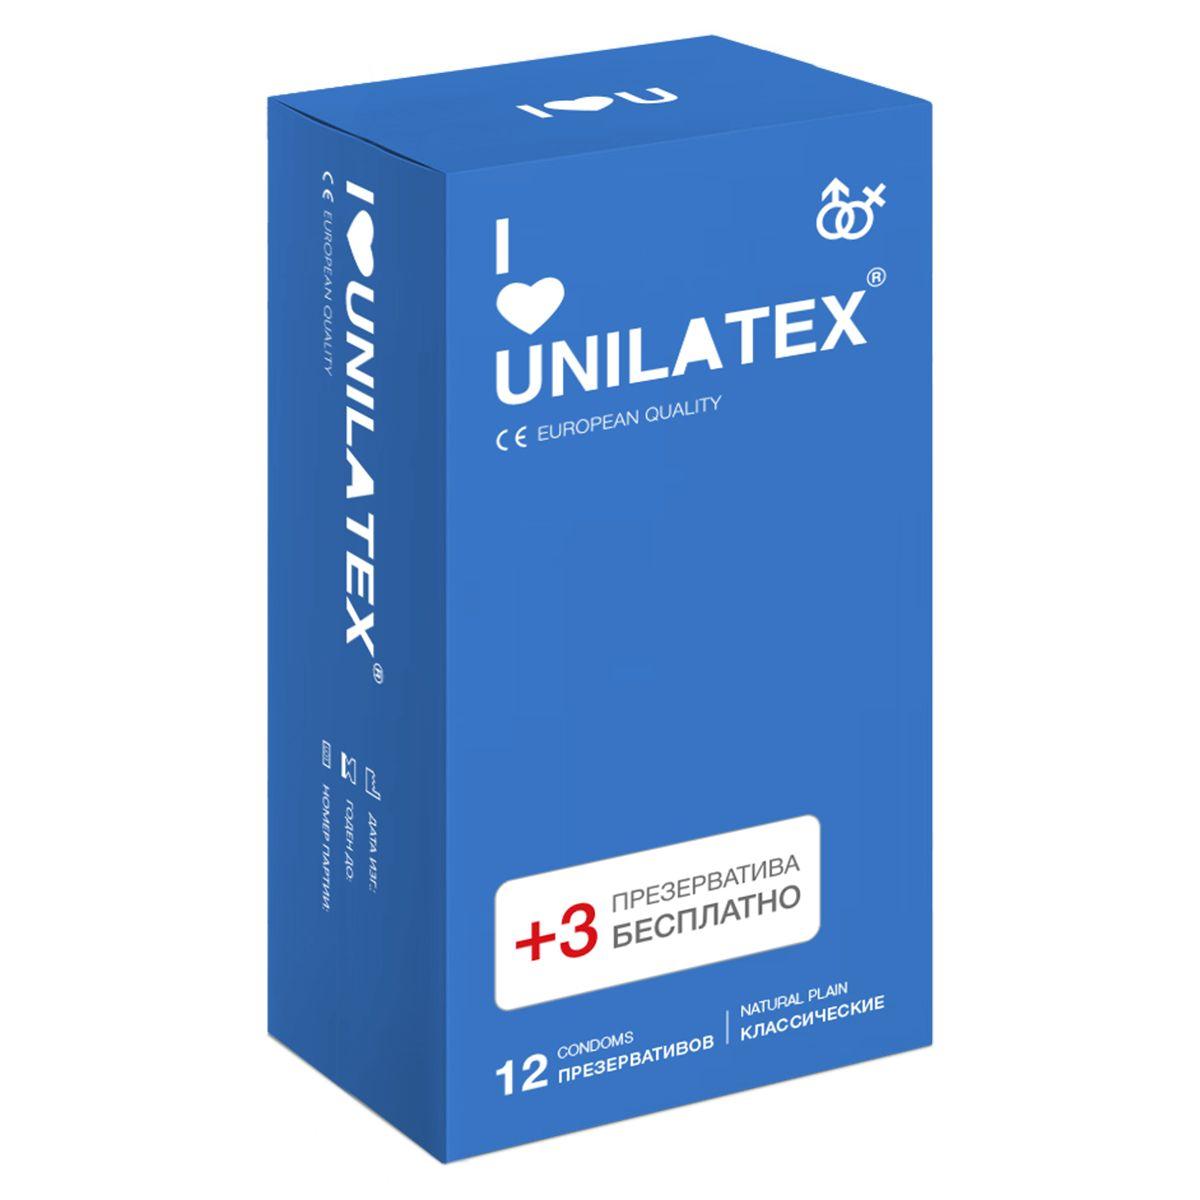 Фото Классические презервативы Unilatex Natural Plain - 12 шт. + 3 шт. в подарок